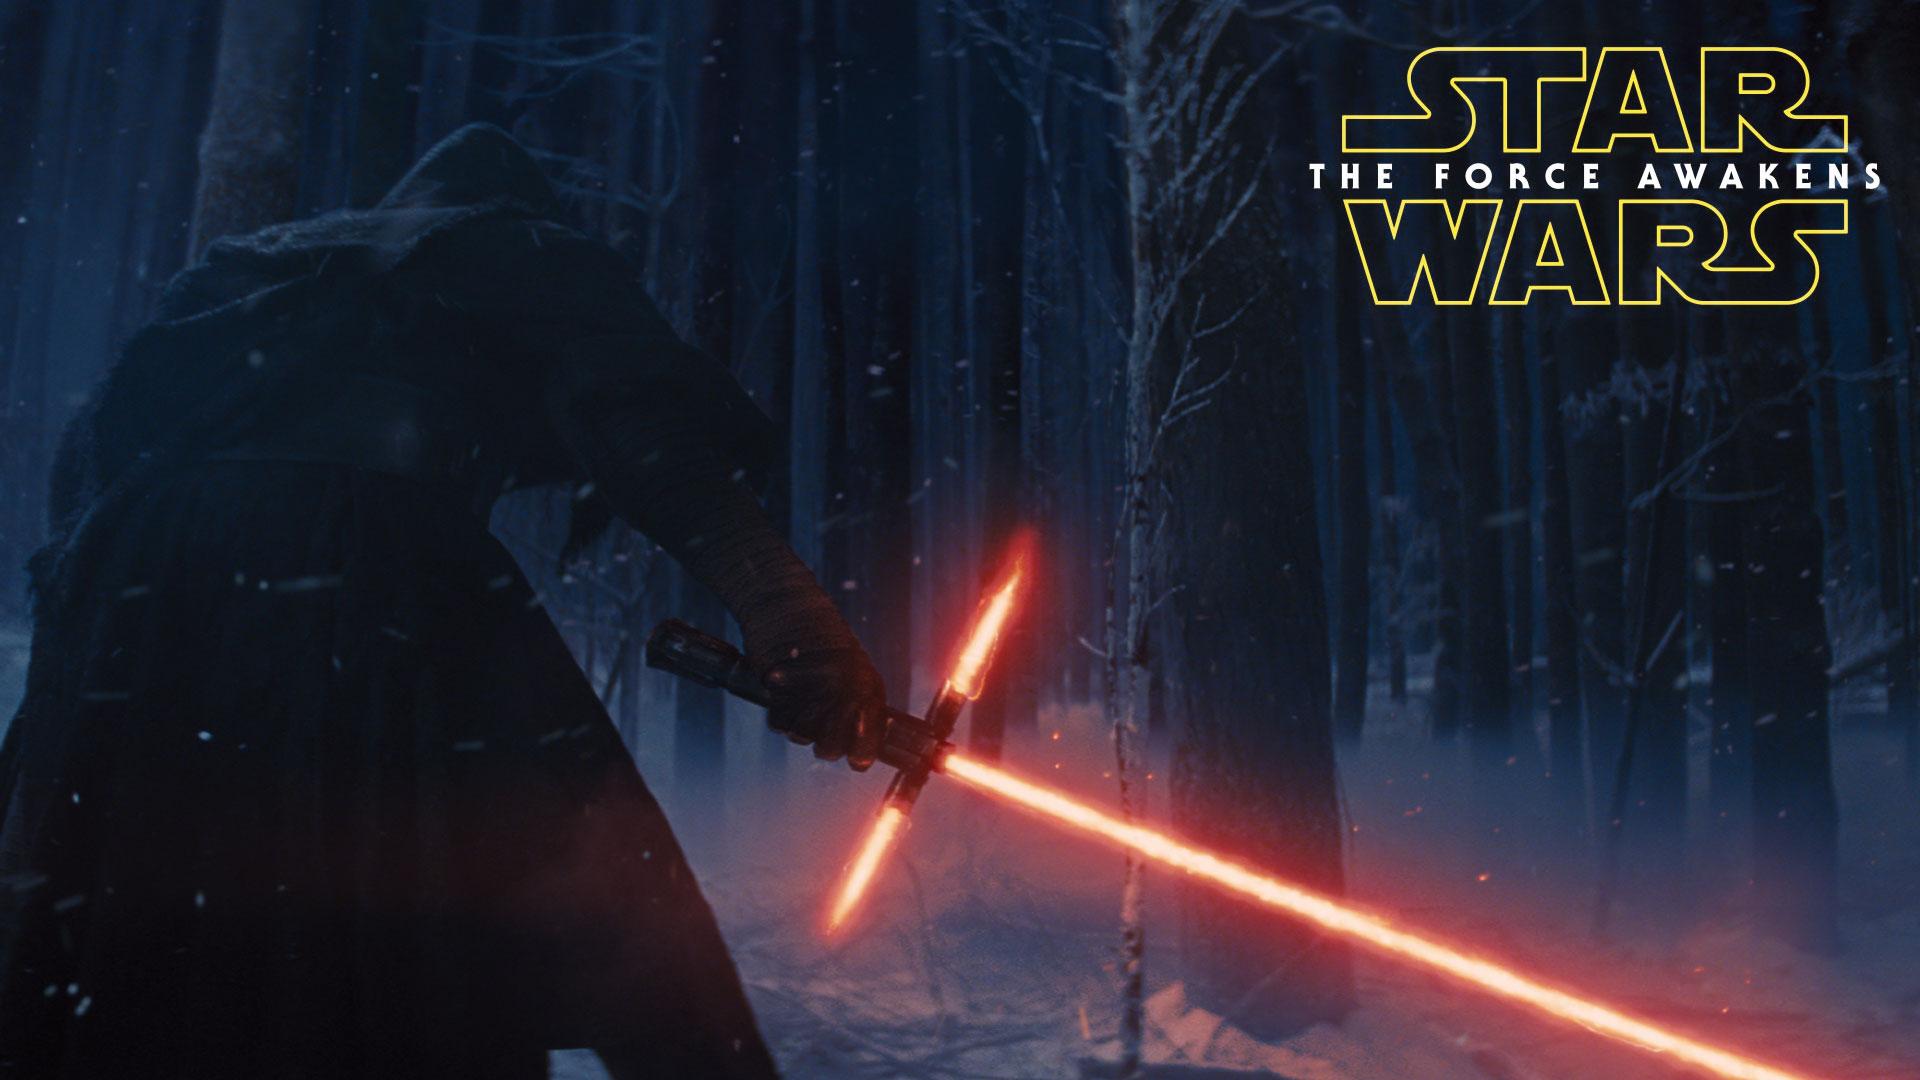 Force Awakens Movie Spoon Wall